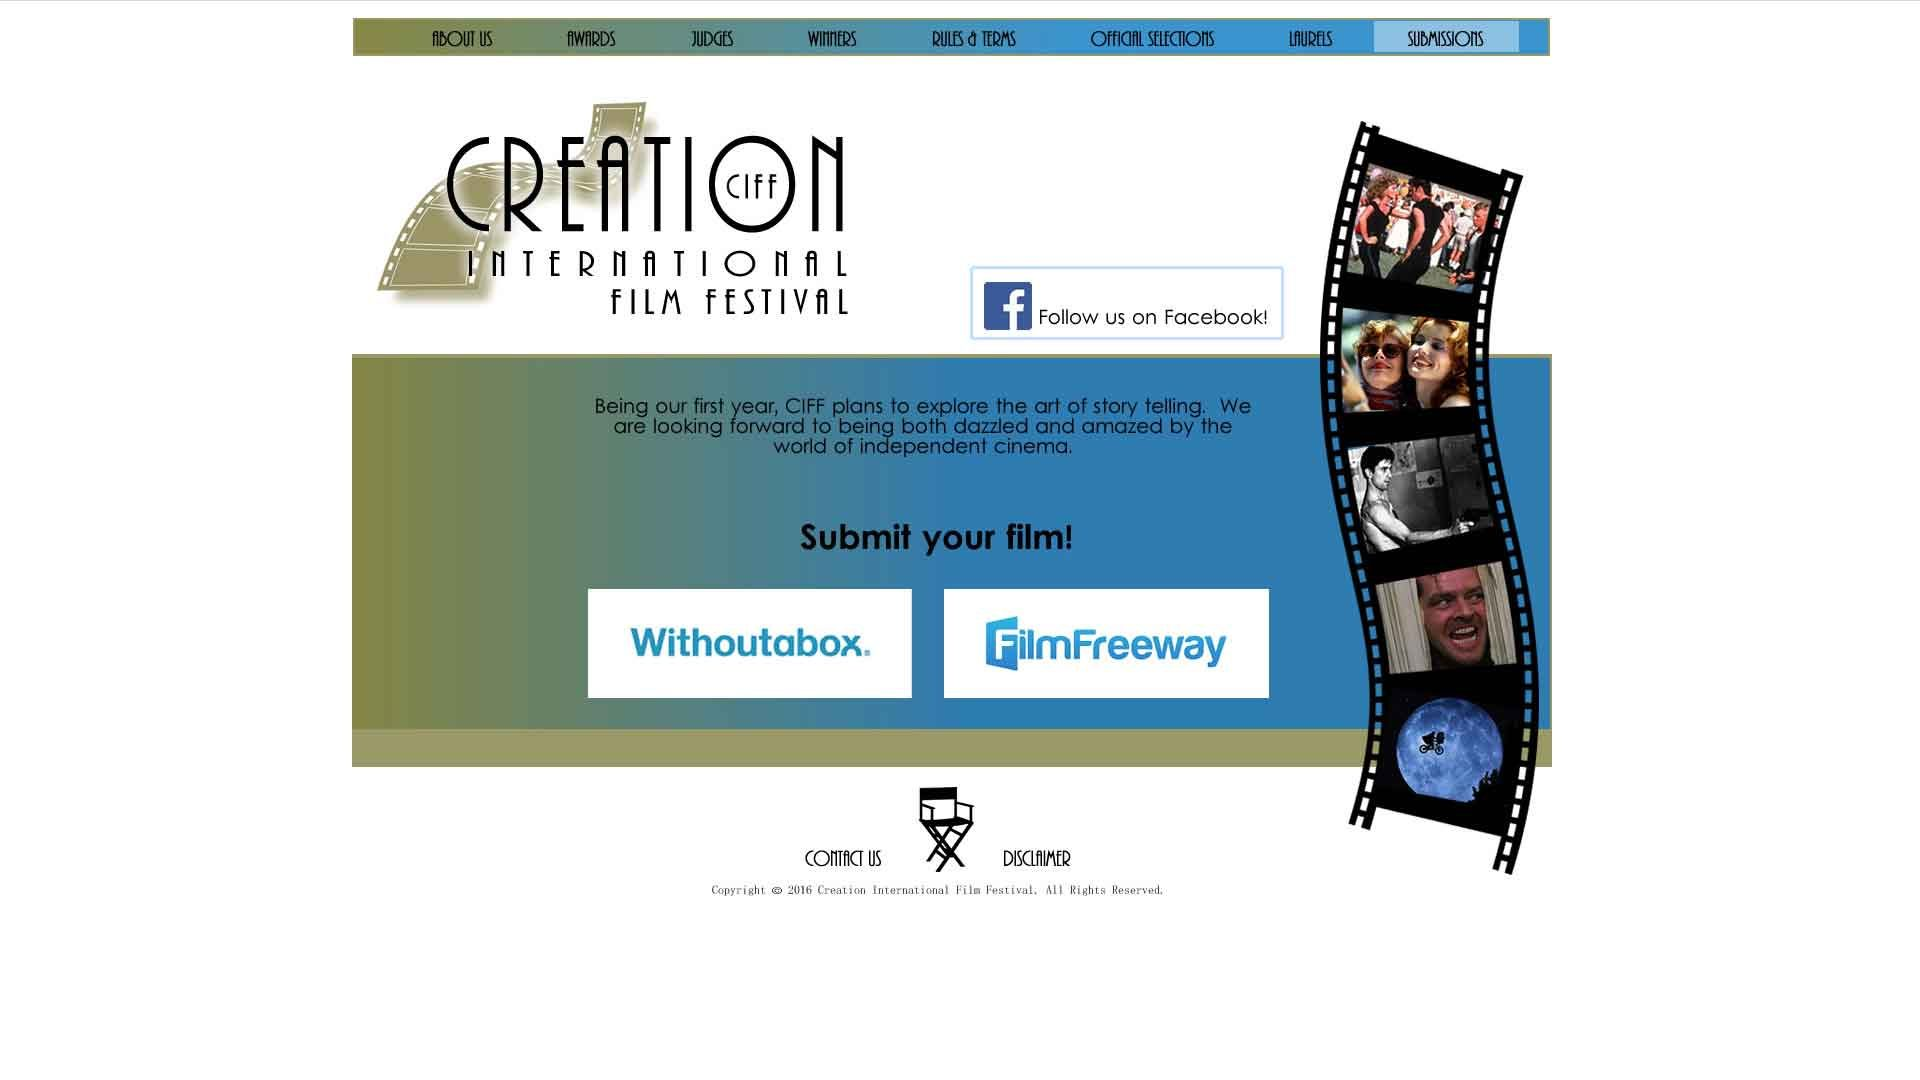 Creation International Film Festival